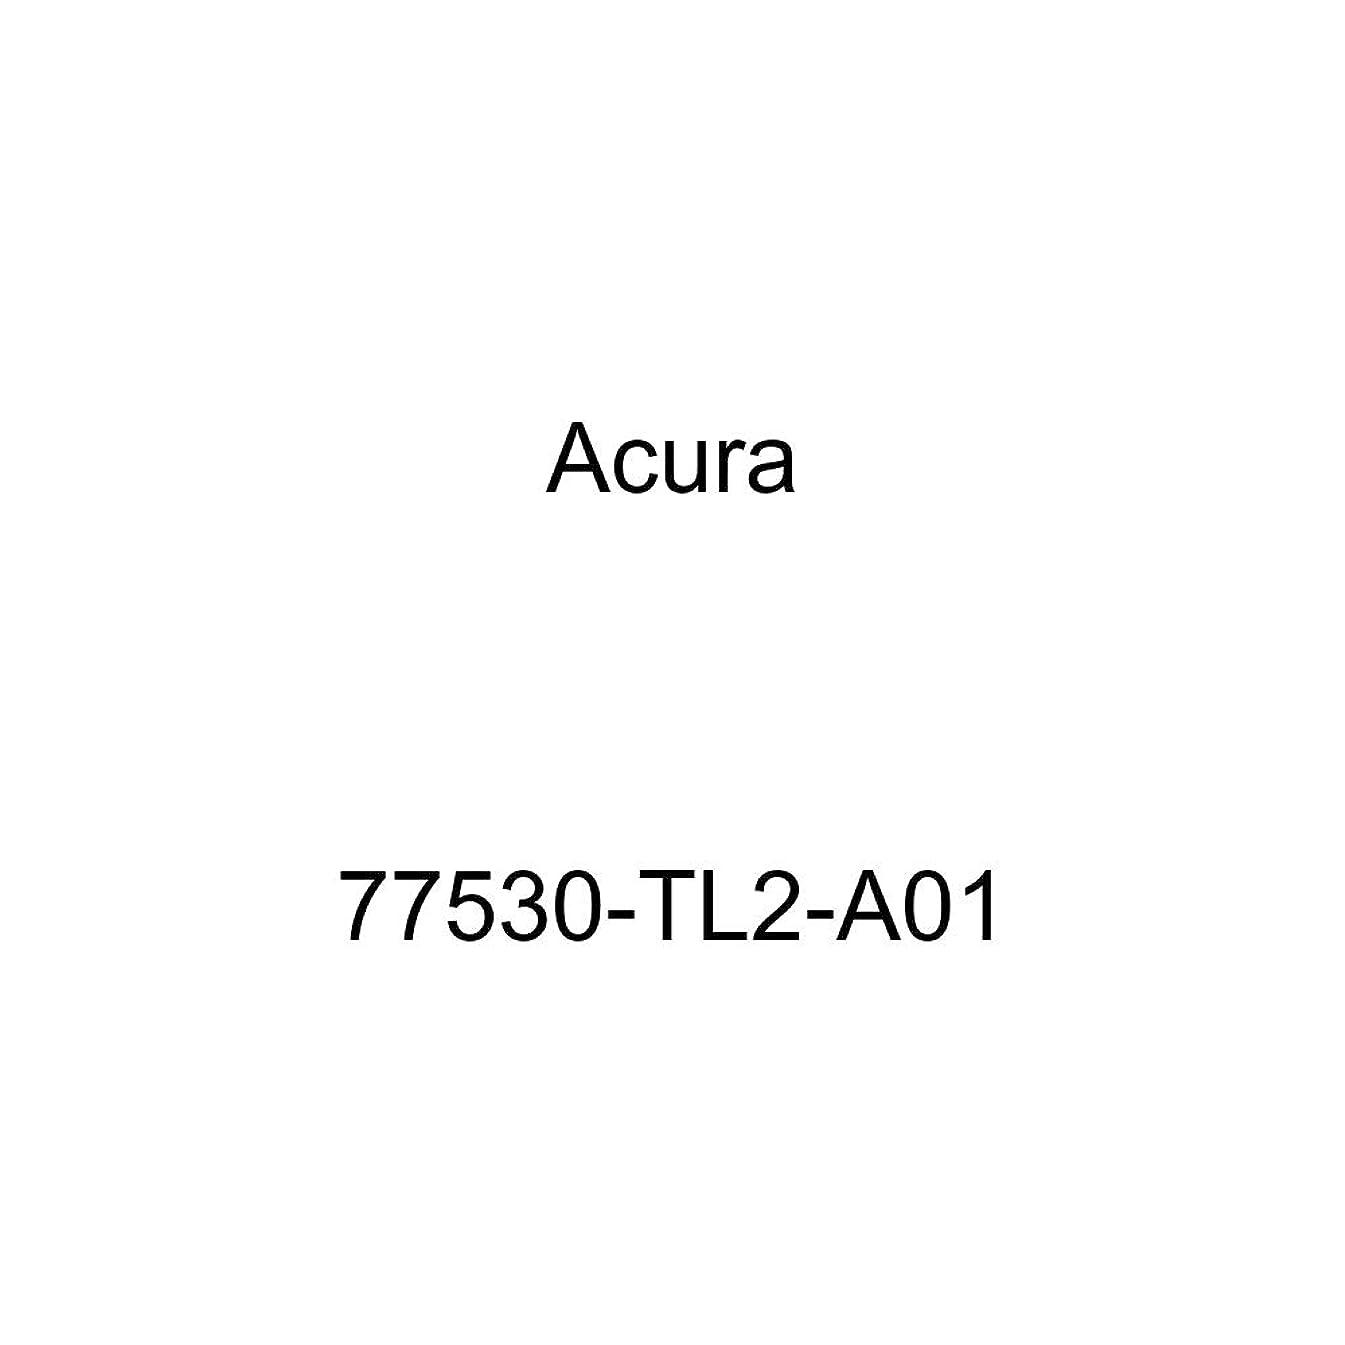 Acura 77530-TL2-A01 Glove Box Support